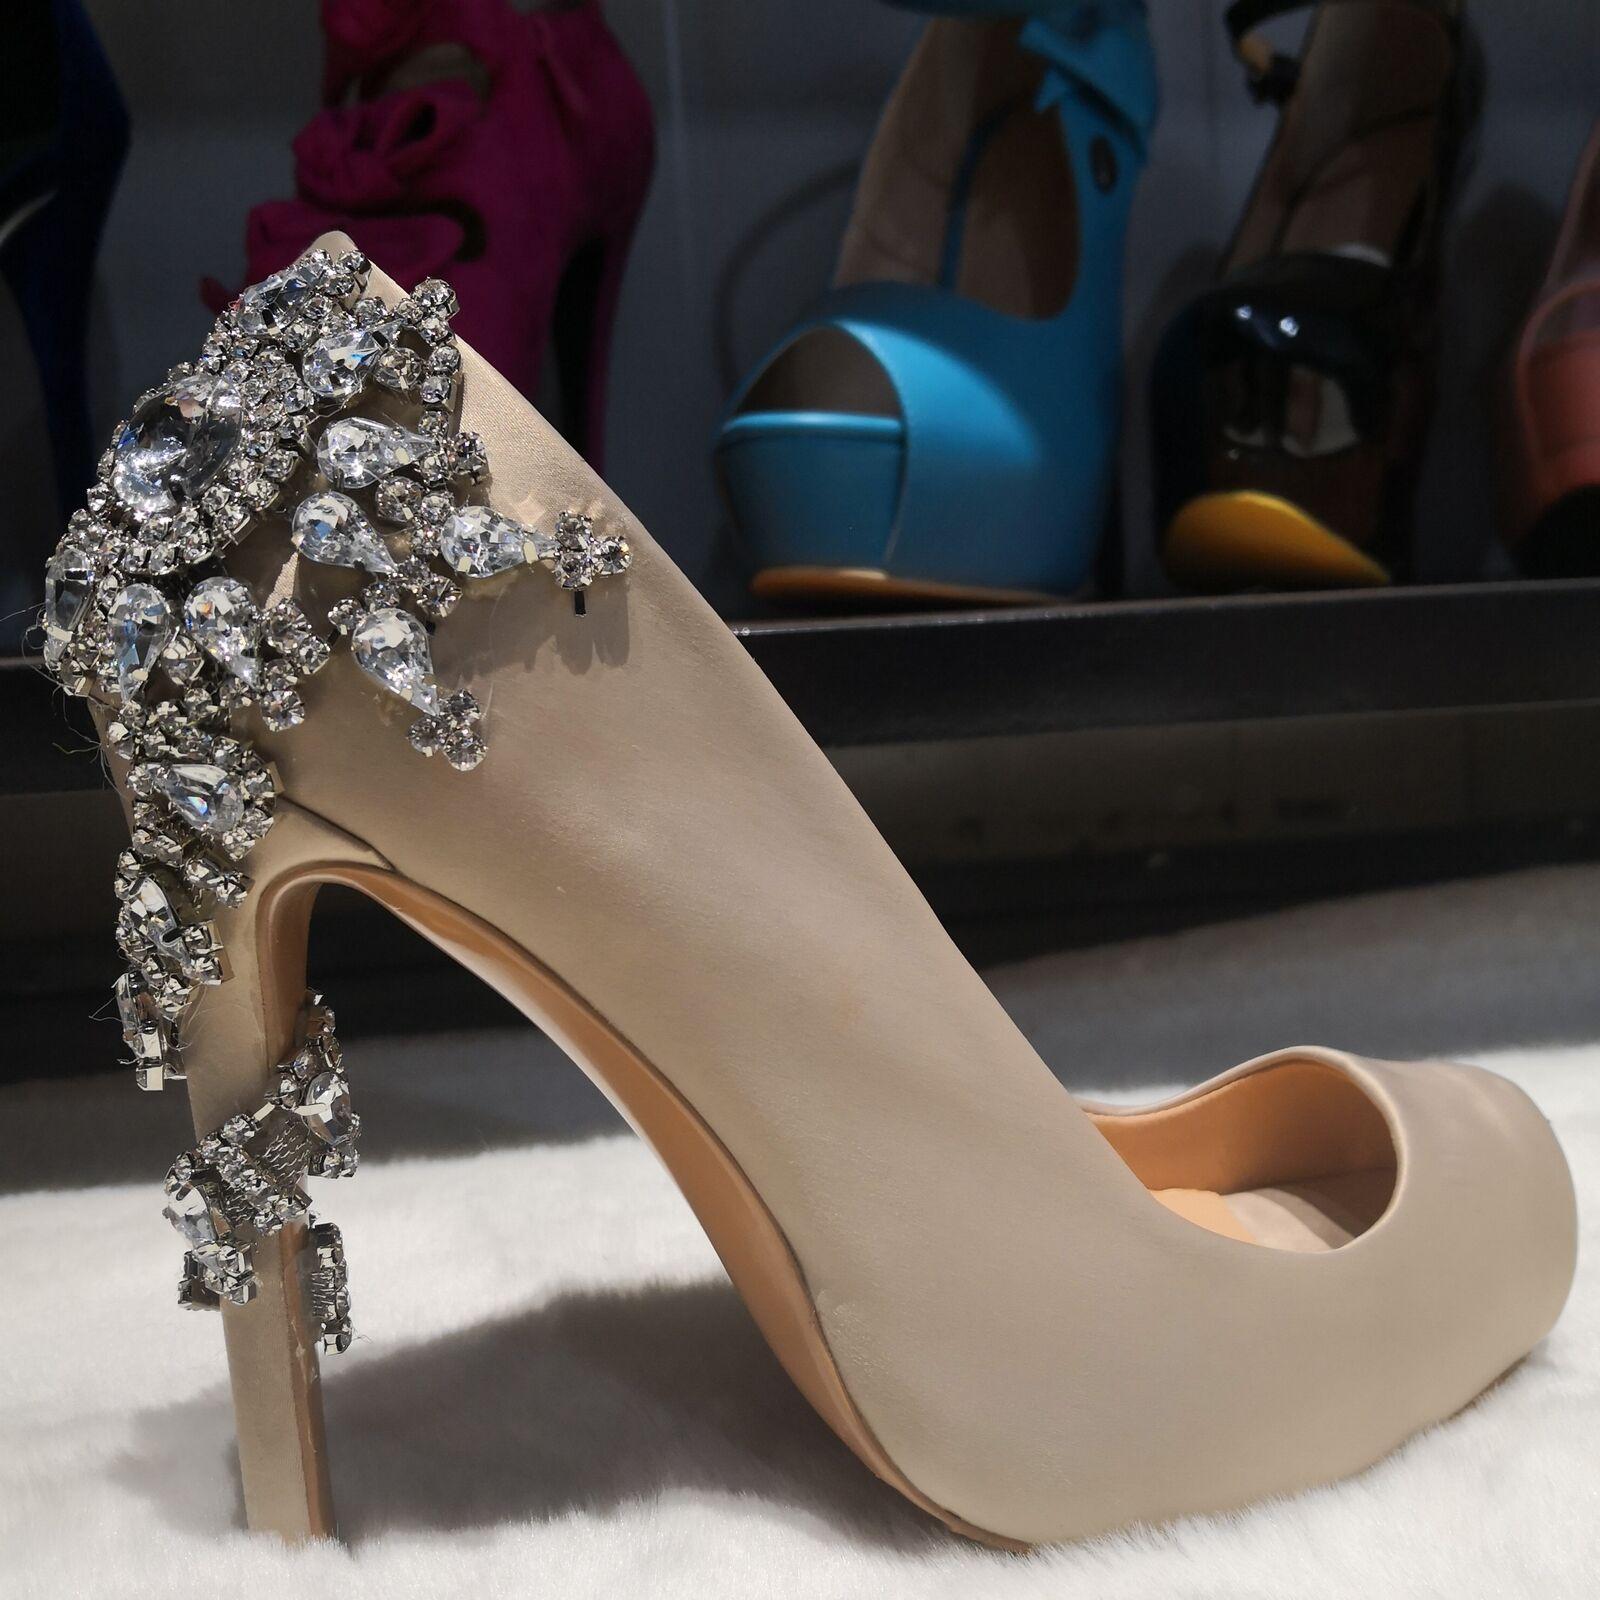 Slip on Pumps Heels Us 4-12 high Heels OL Summer scarpe donna New Hot Glitters